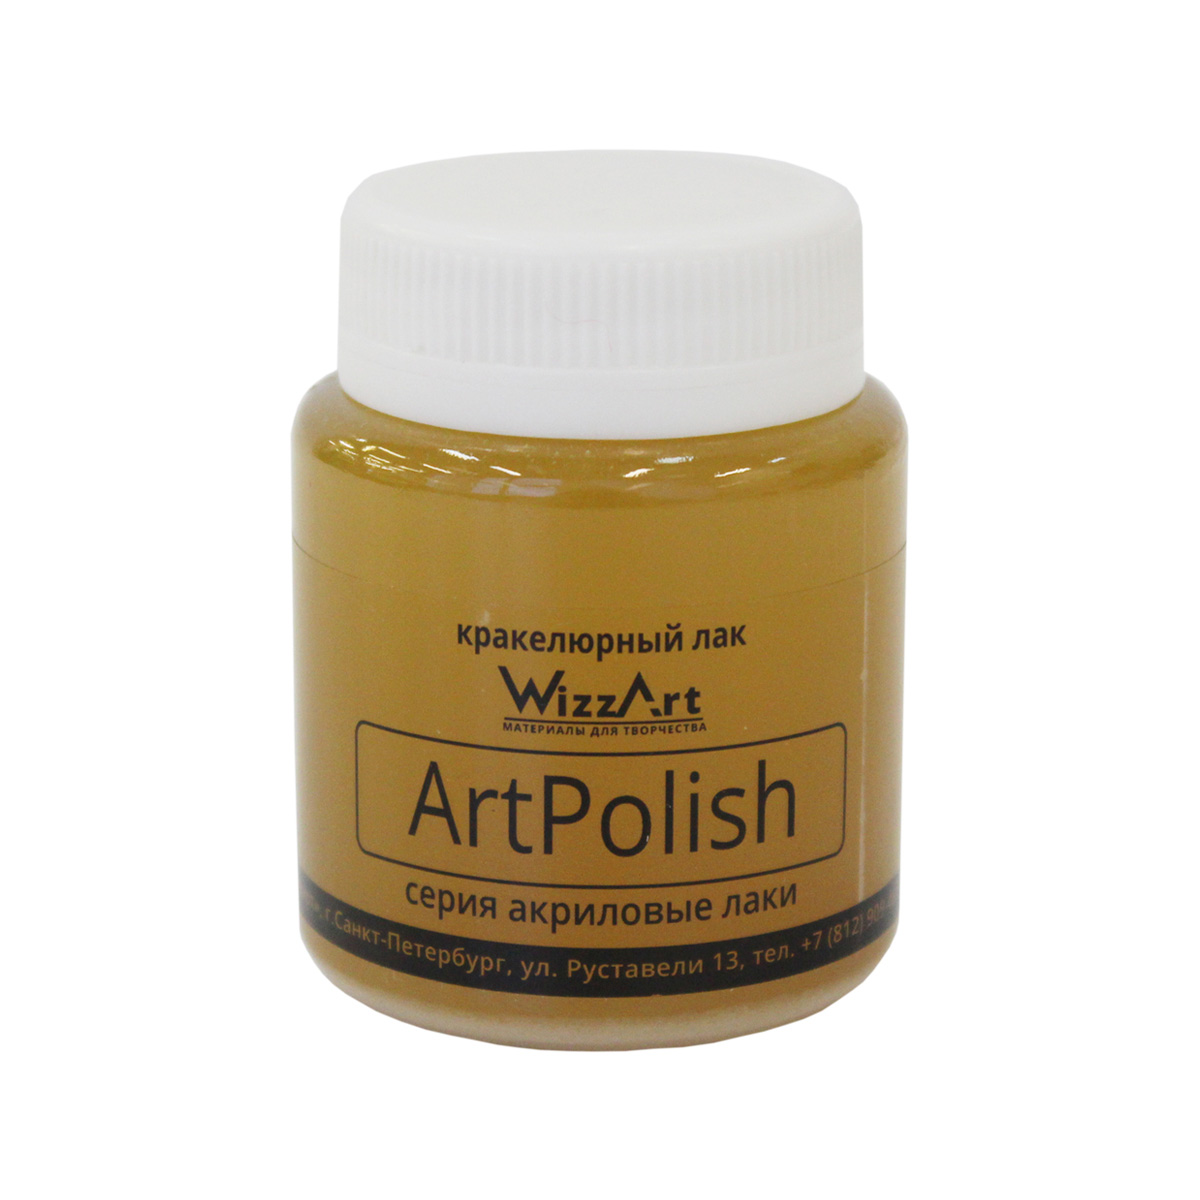 Кракелюрный лак ArtPolish 80мл Wizzart